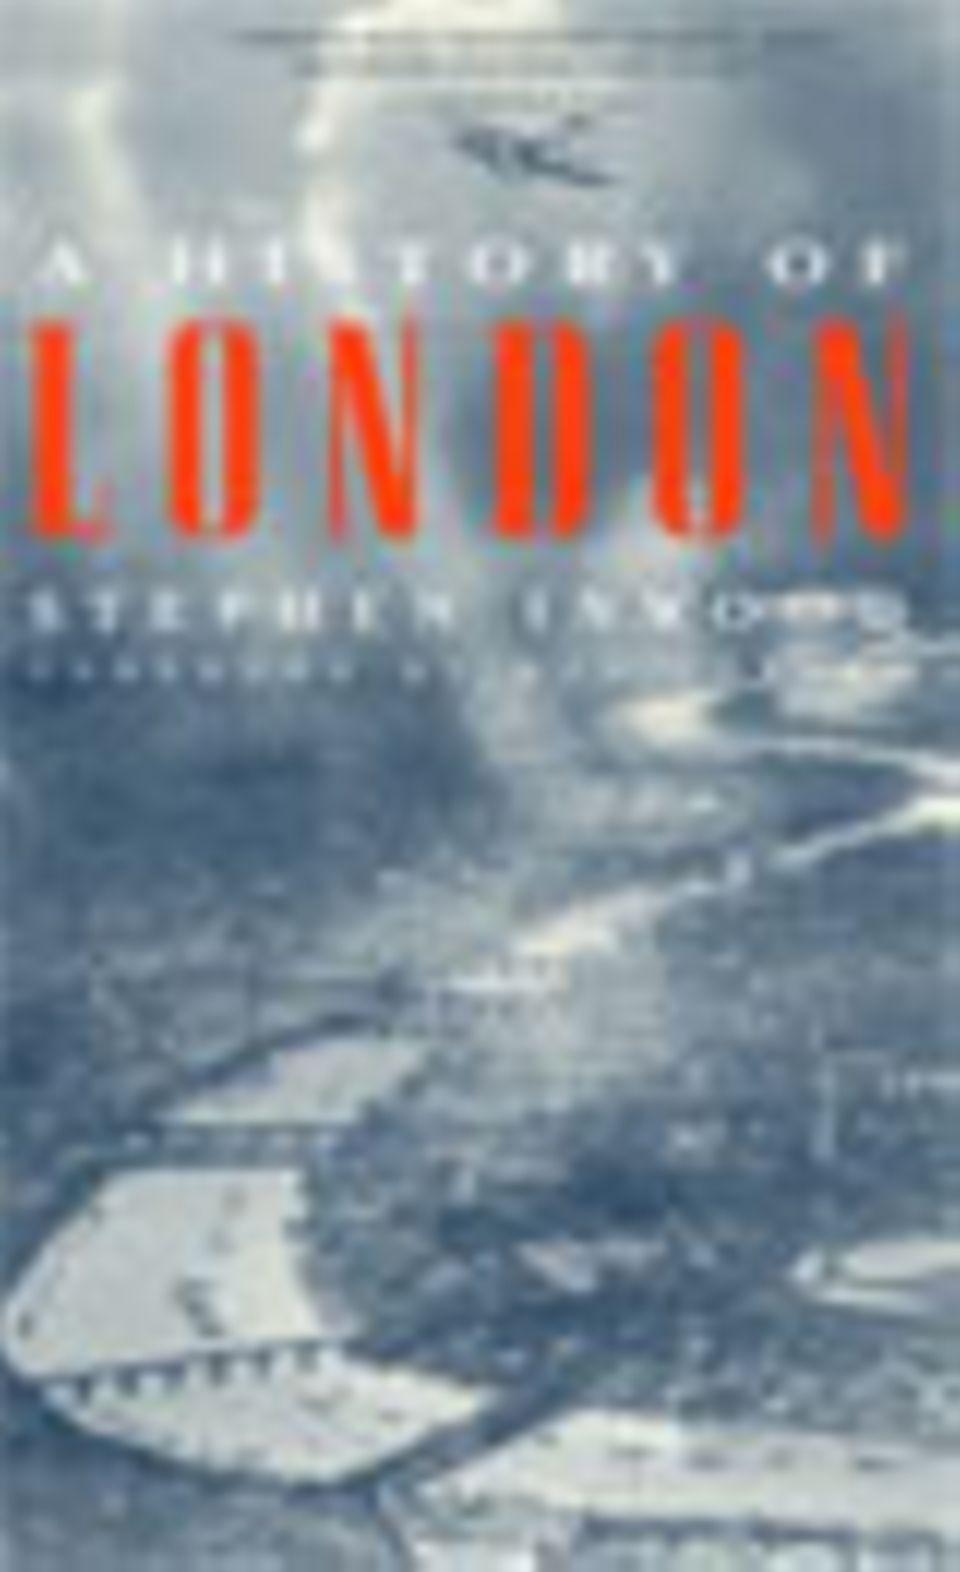 Buchtipps: London